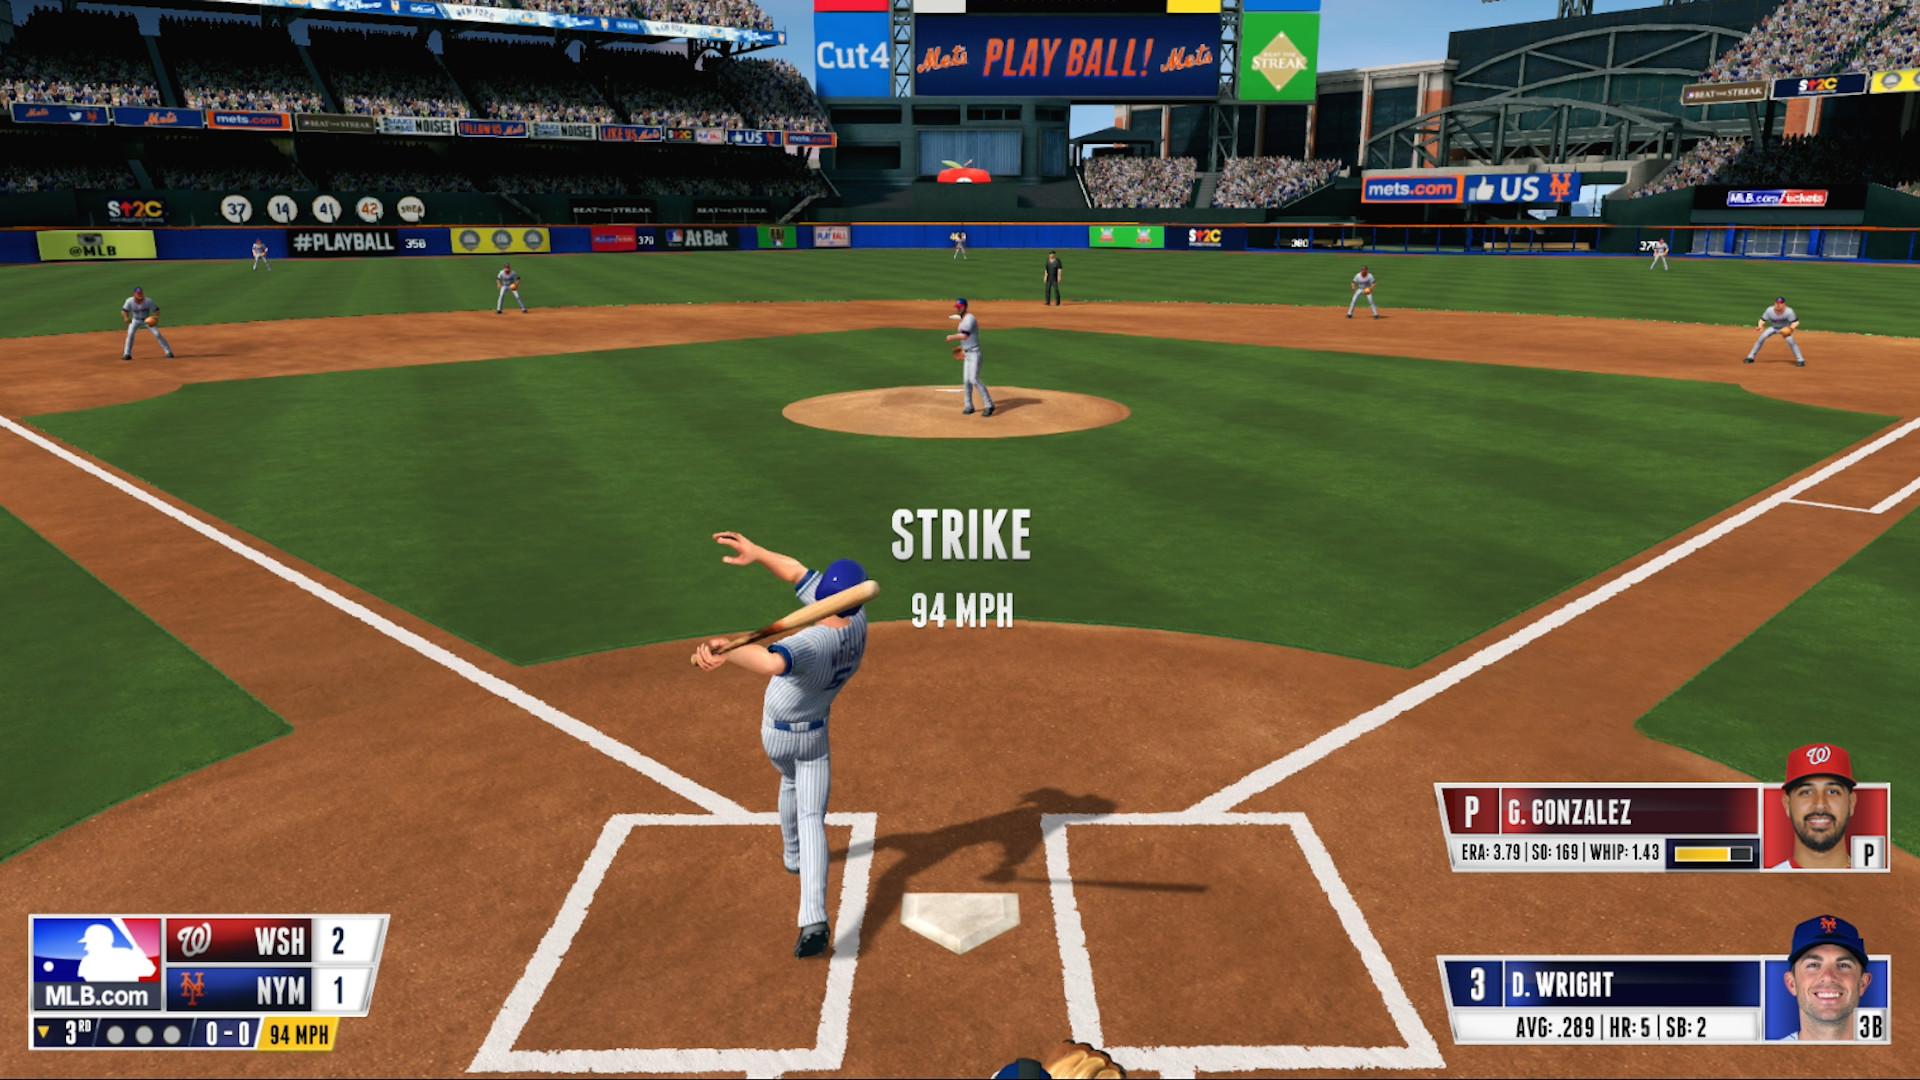 R.B.I. Baseball 16 image 1